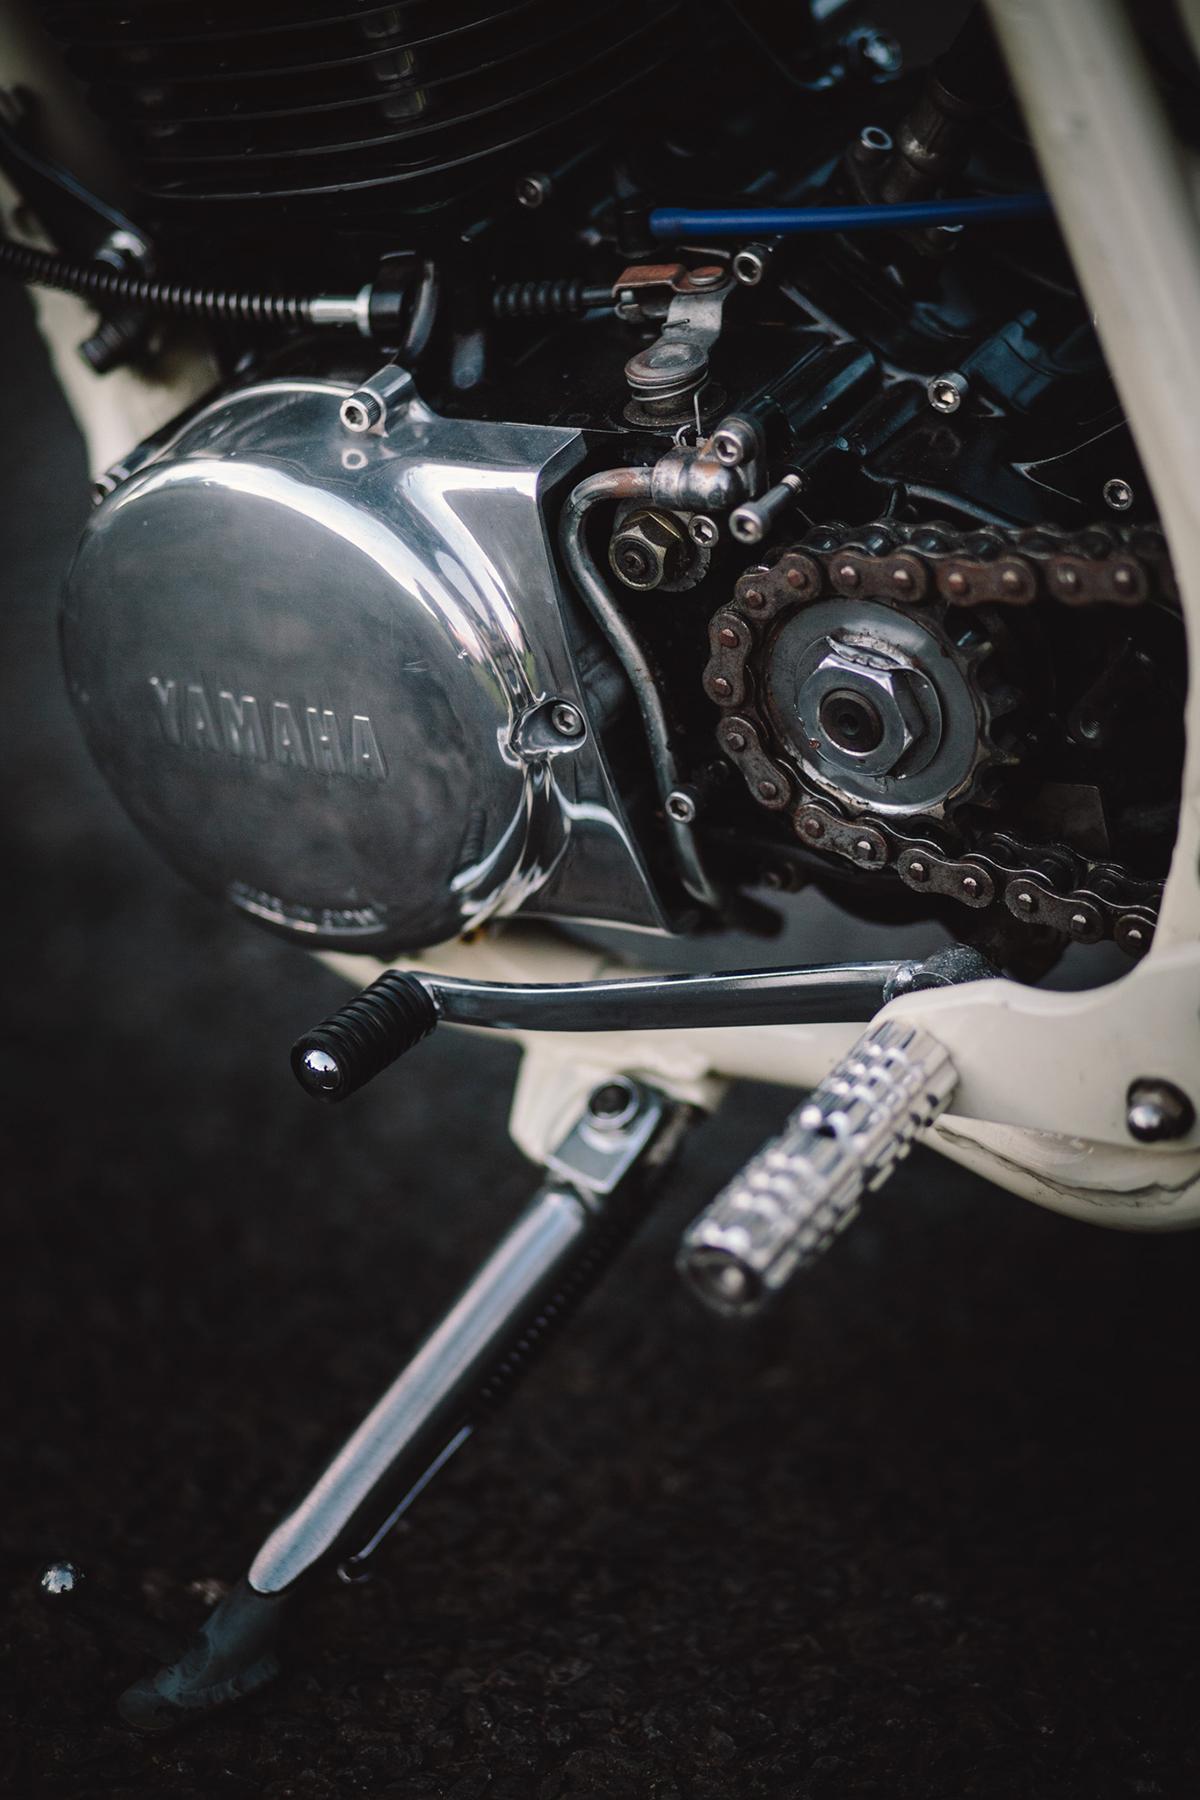 Yamaha_SR400_Bobber_1067